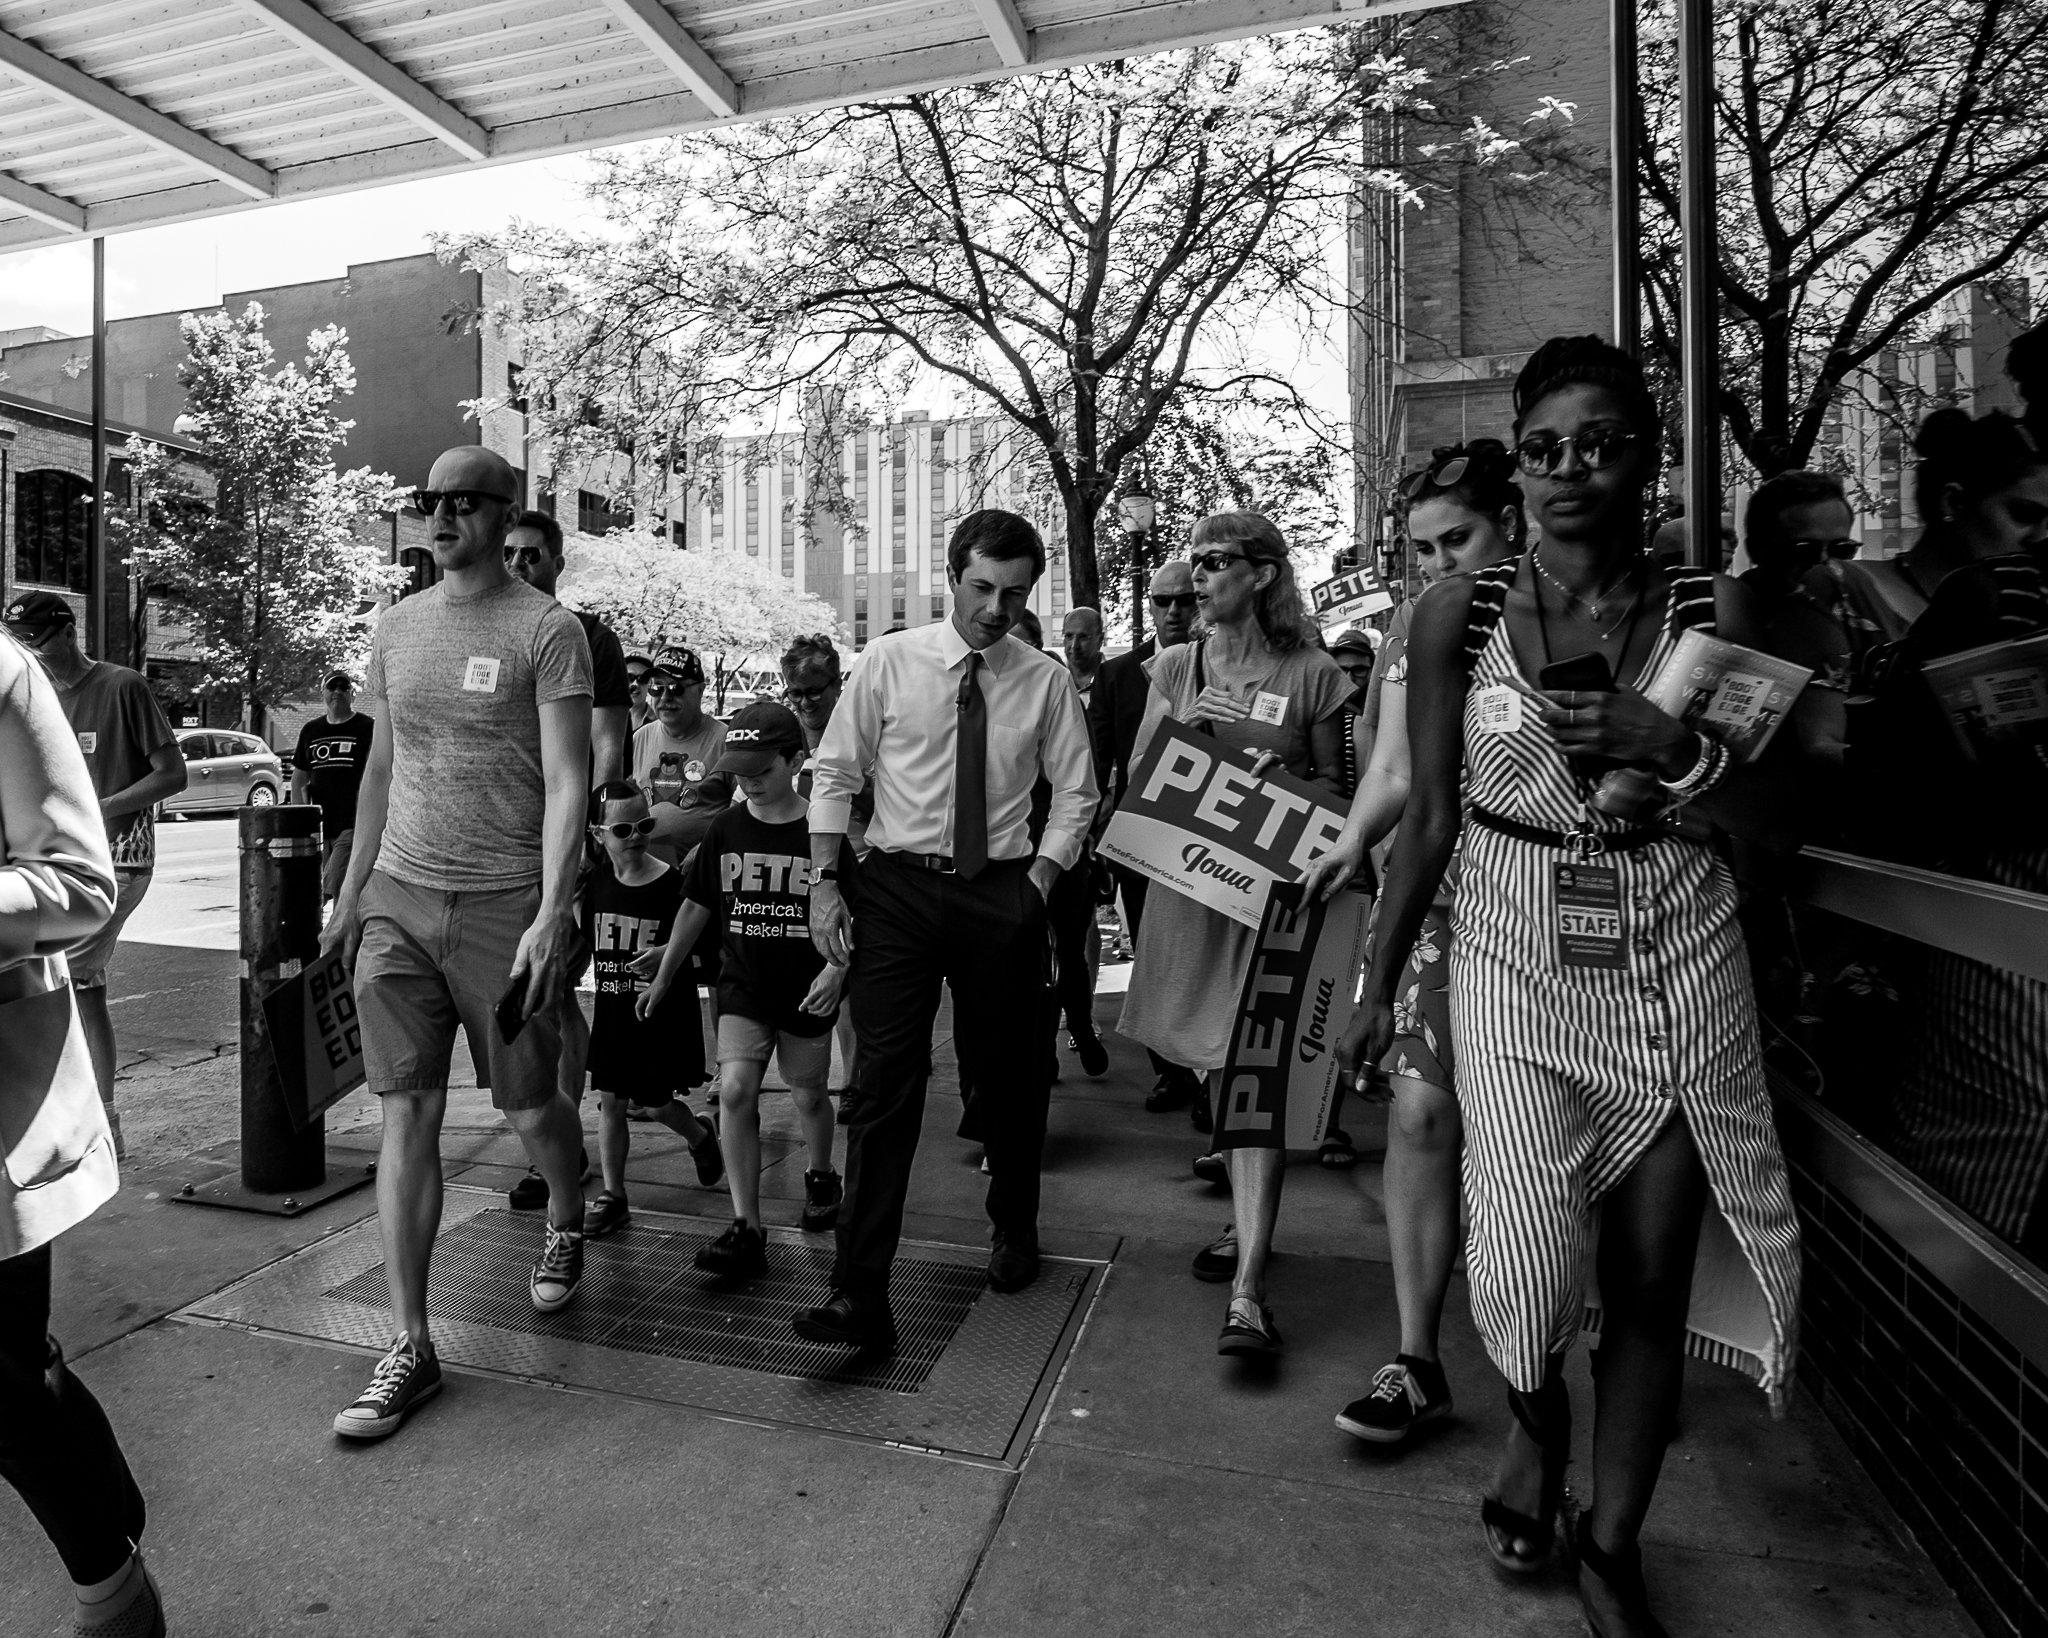 Pete Buttigieg leading supporters through downtown Cedar Rapids, Iowa